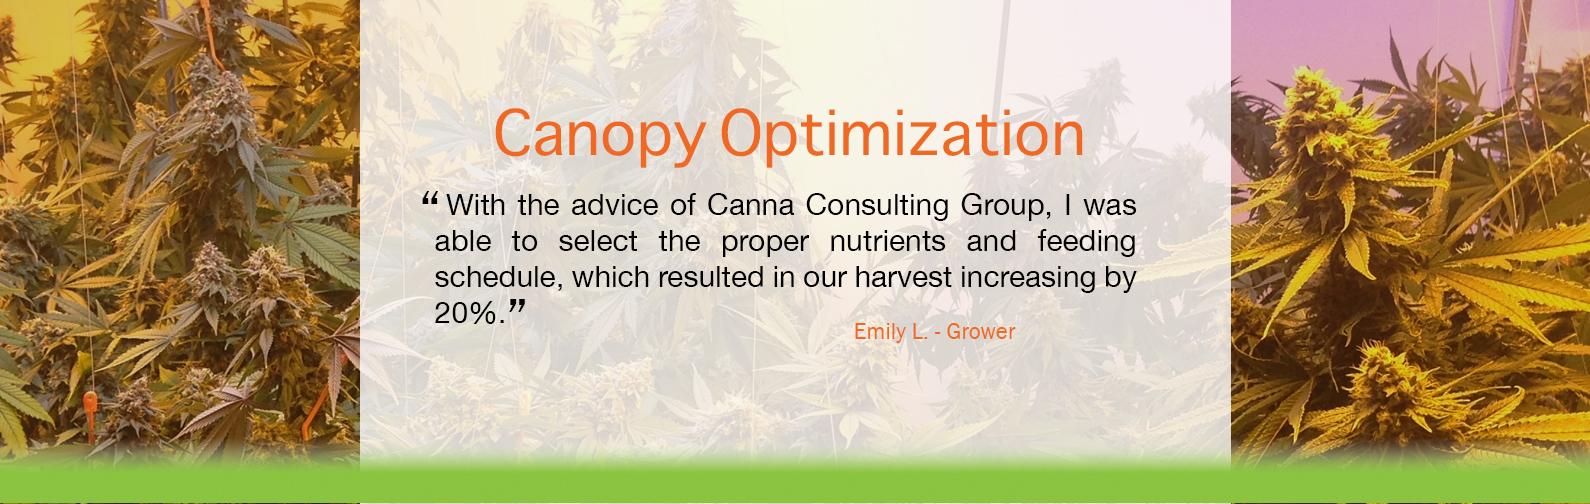 Slide-2-Canopy-Optimization